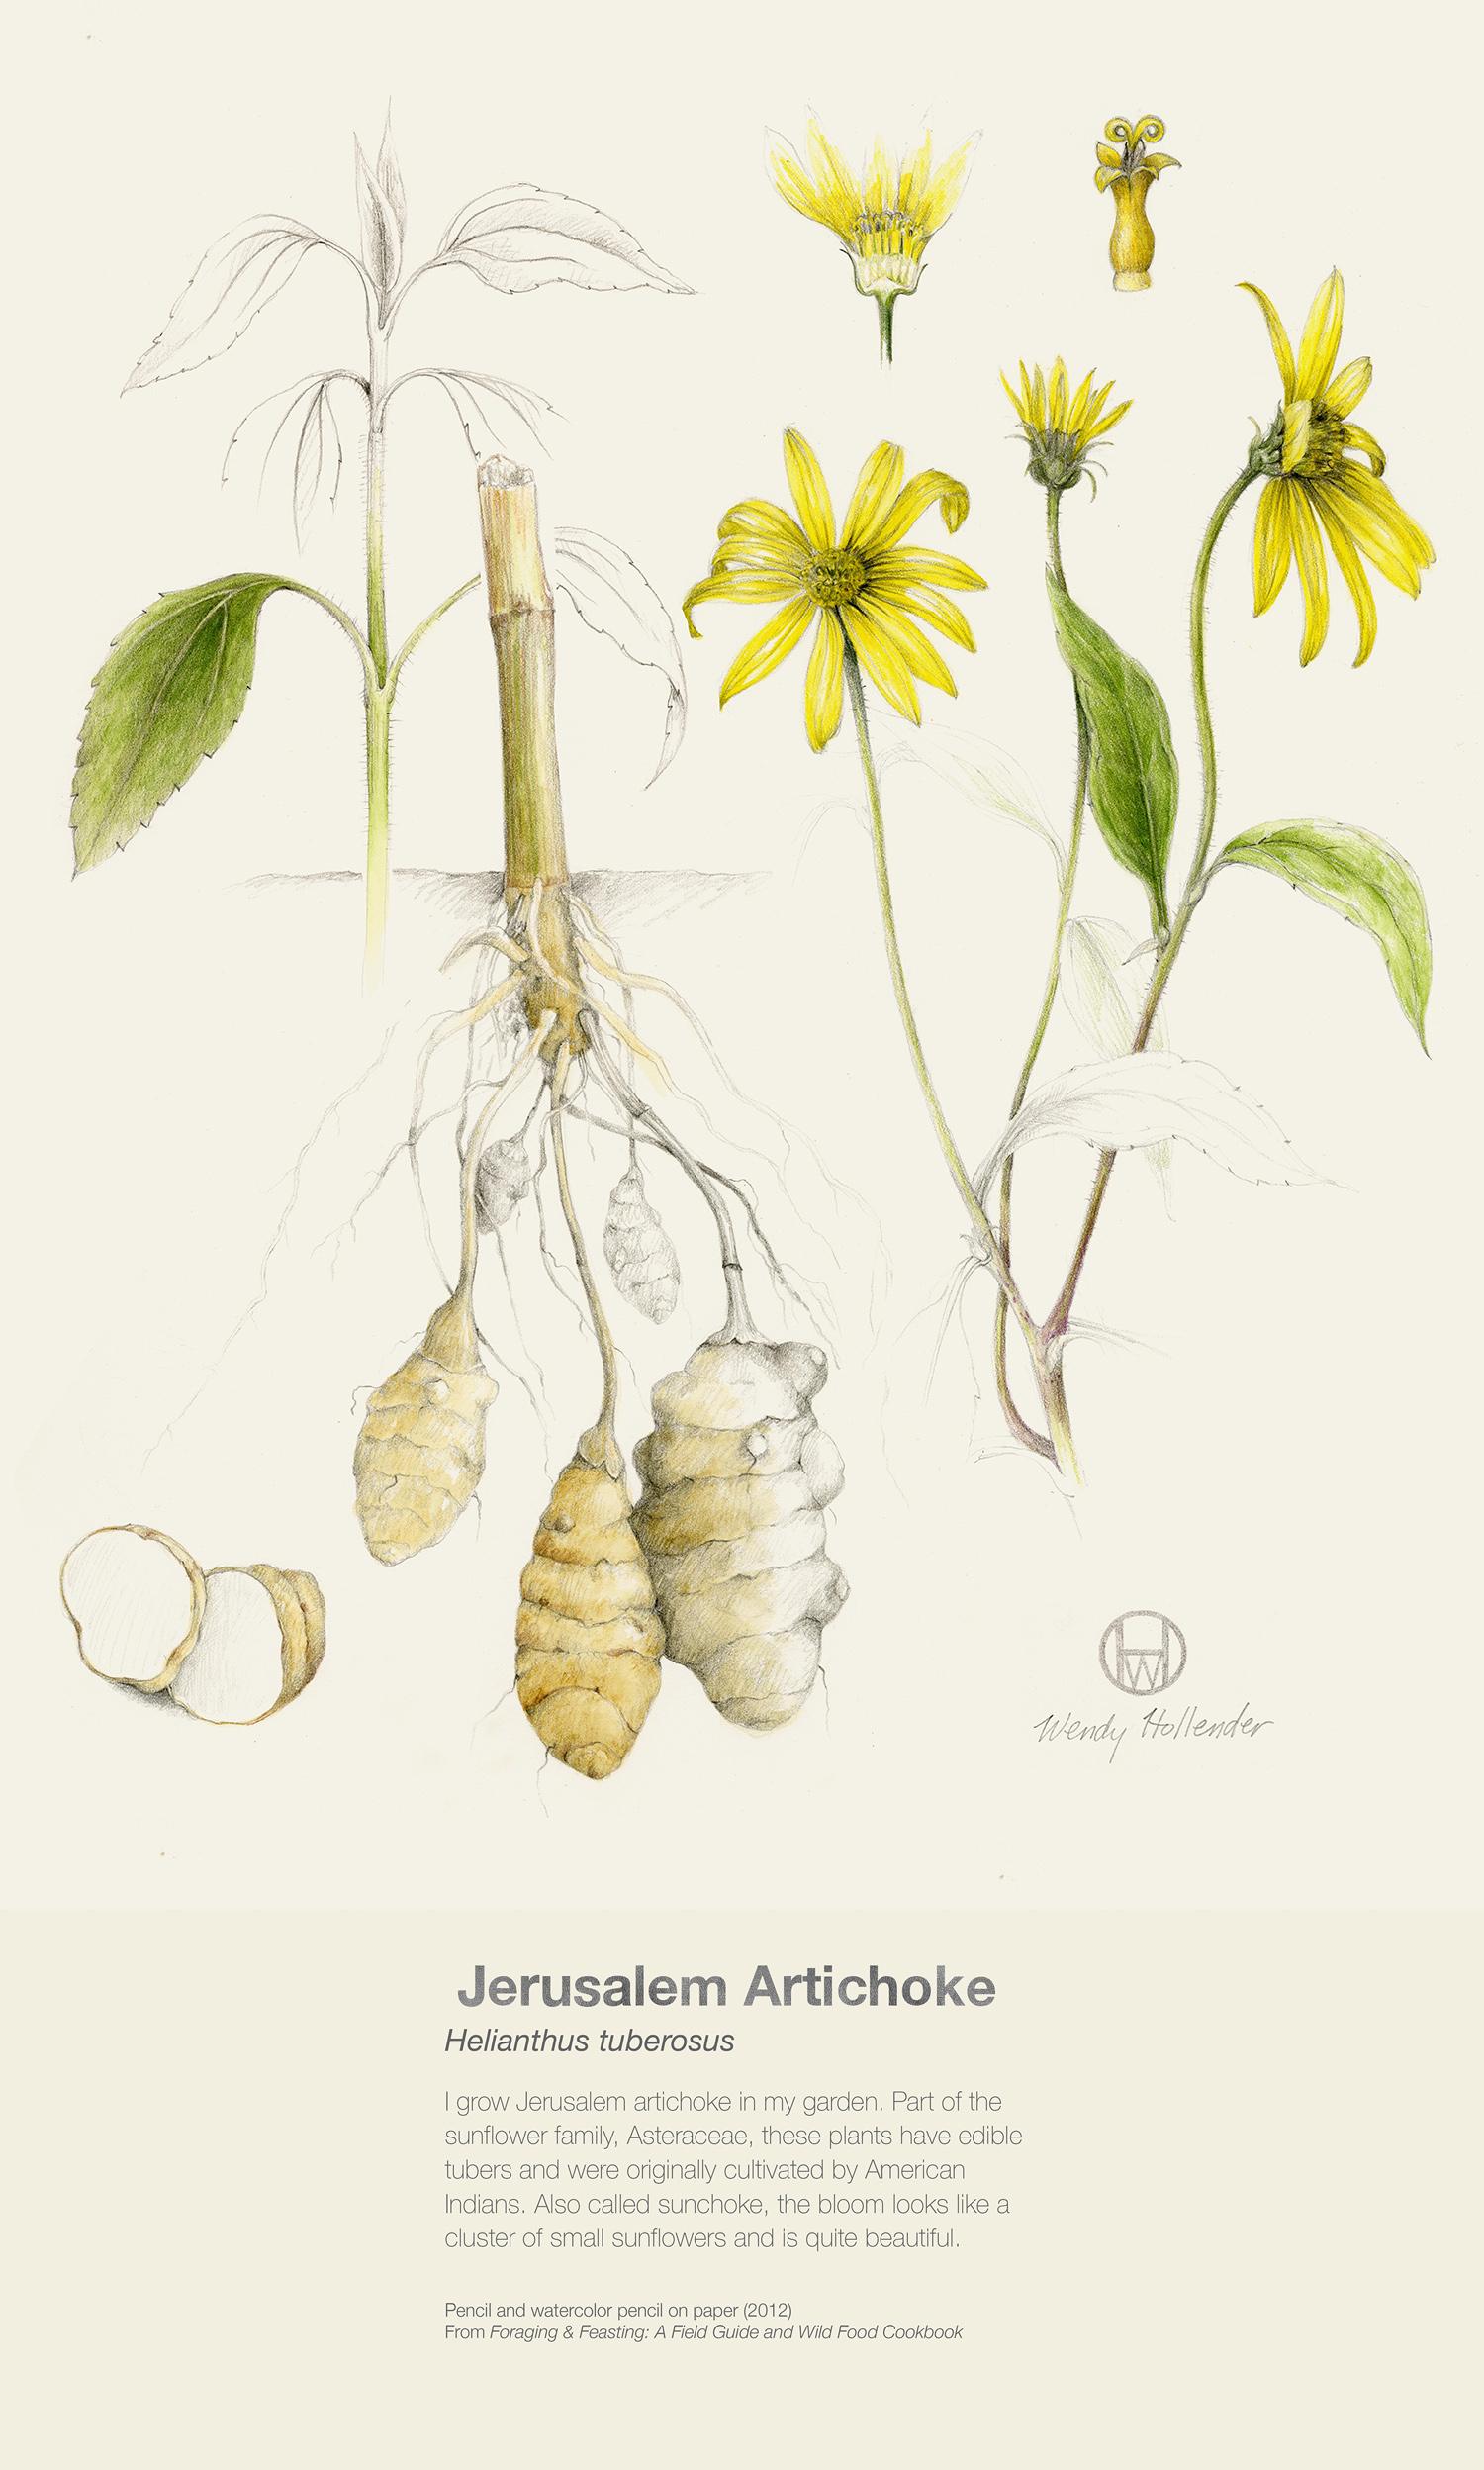 Jerusalem Artichoke - Helianthus tuberosus